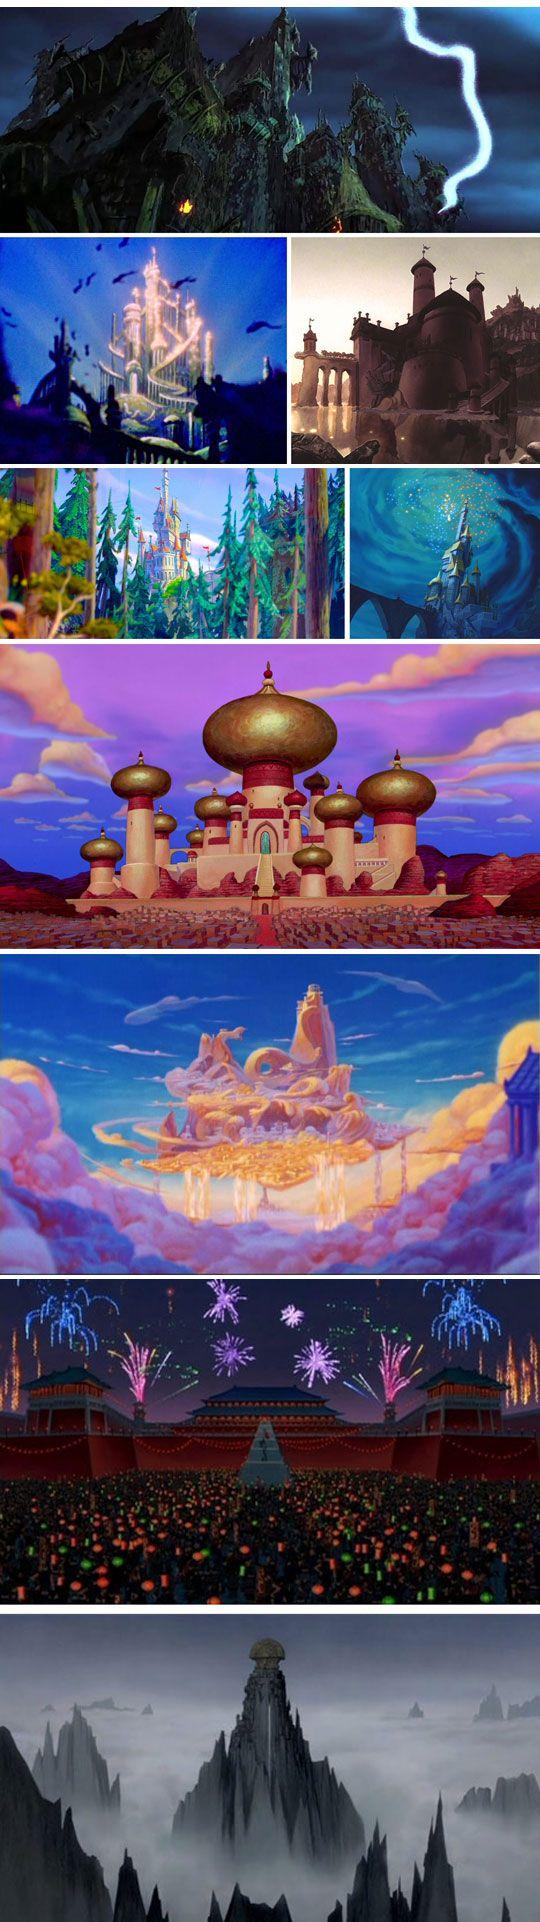 cool-Disney-castles-movies-animated-Aladdin